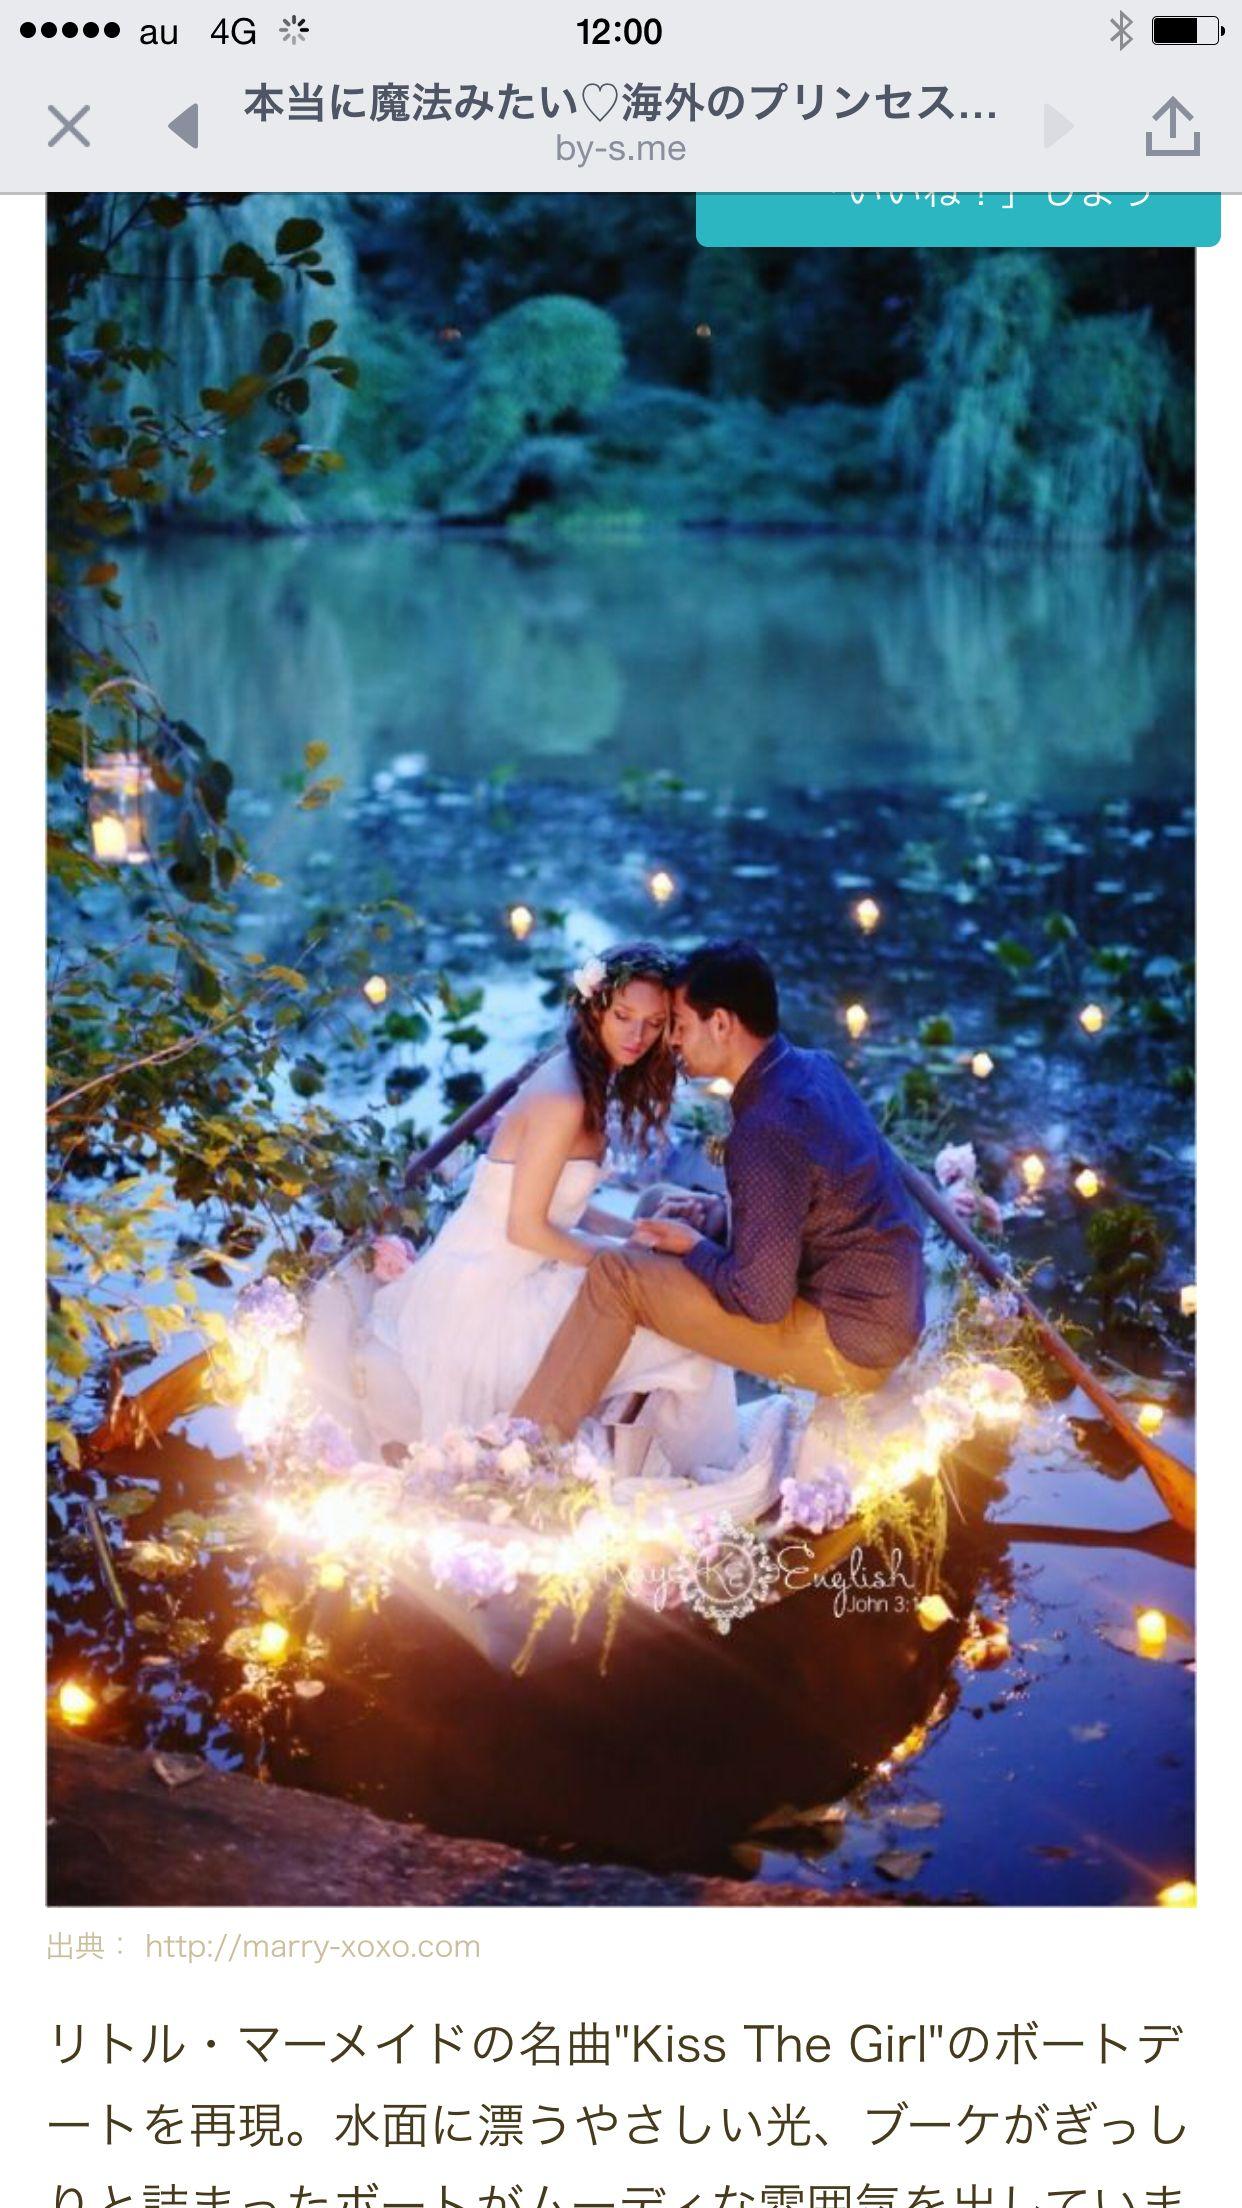 pin by pamela tabbich on 試してみたいこと little mermaid wedding disney inspired wedding storybook wedding